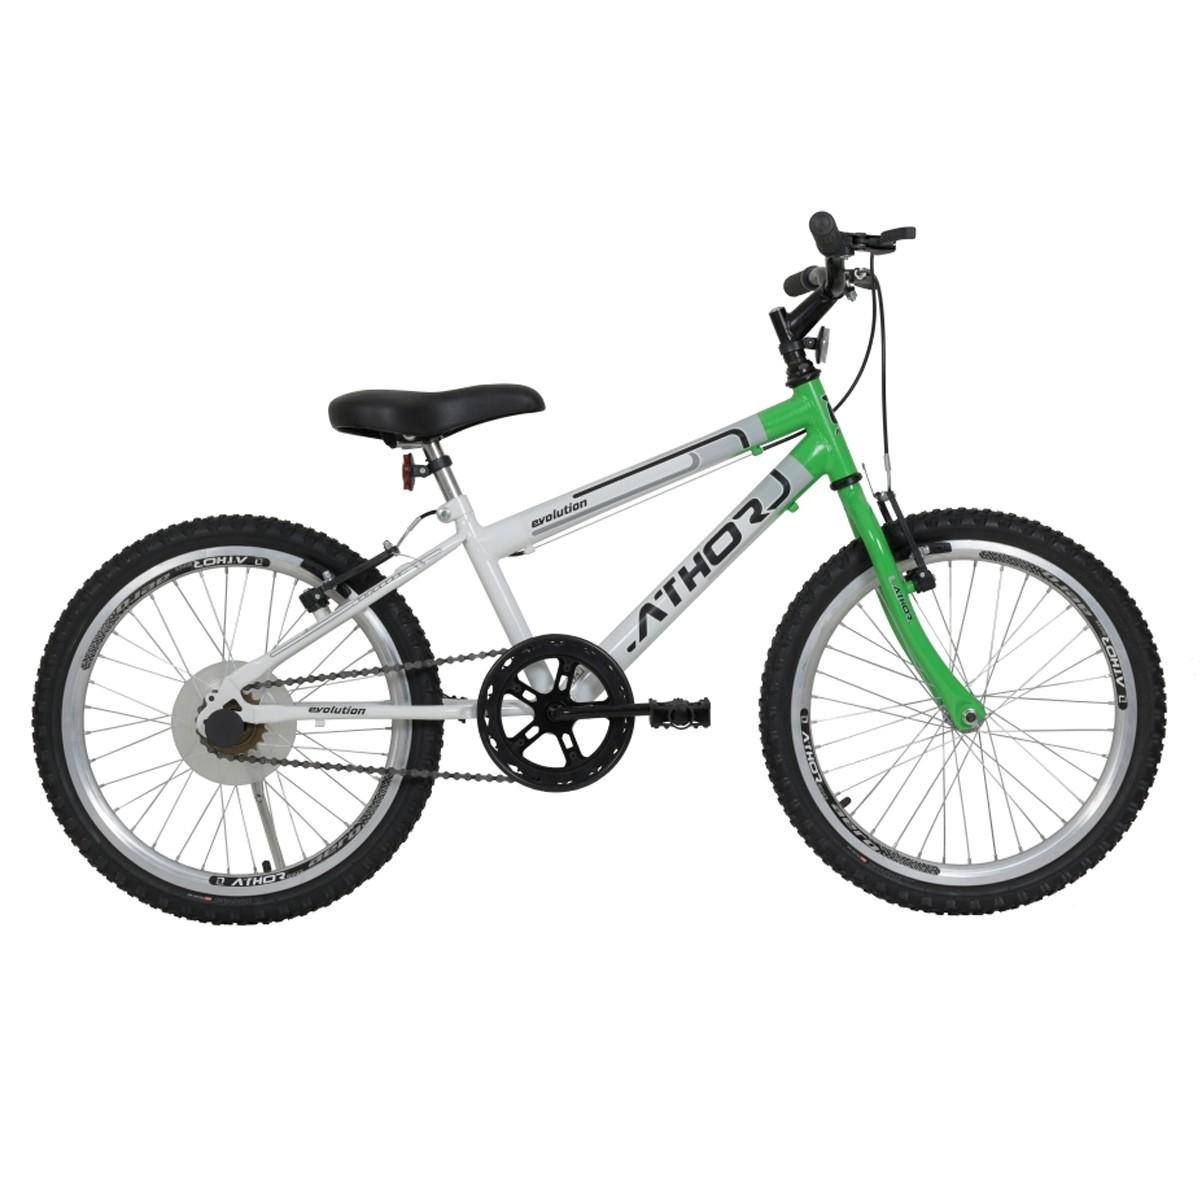 Bicicleta Athor Evolution Infantil Aro 20 Masculino S/Marcha